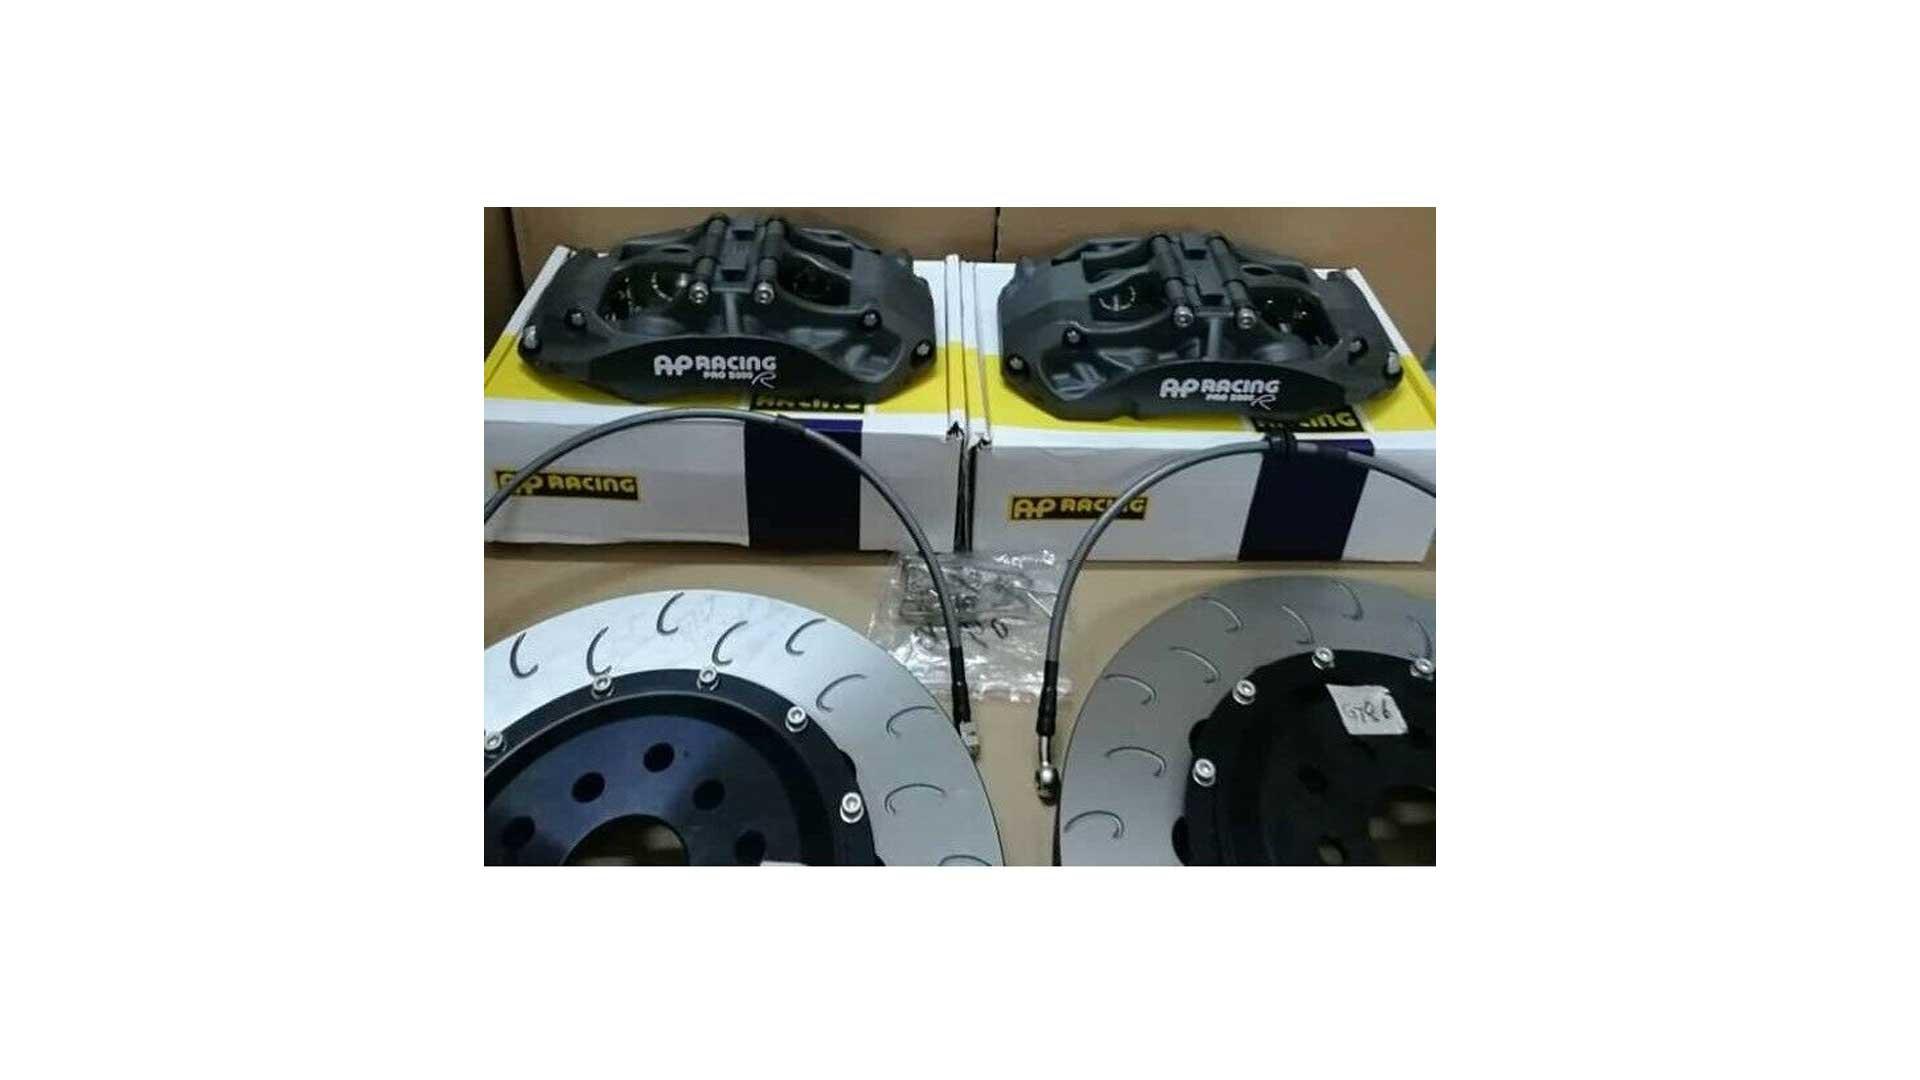 rb racing rotors bmw z4m big brake kit